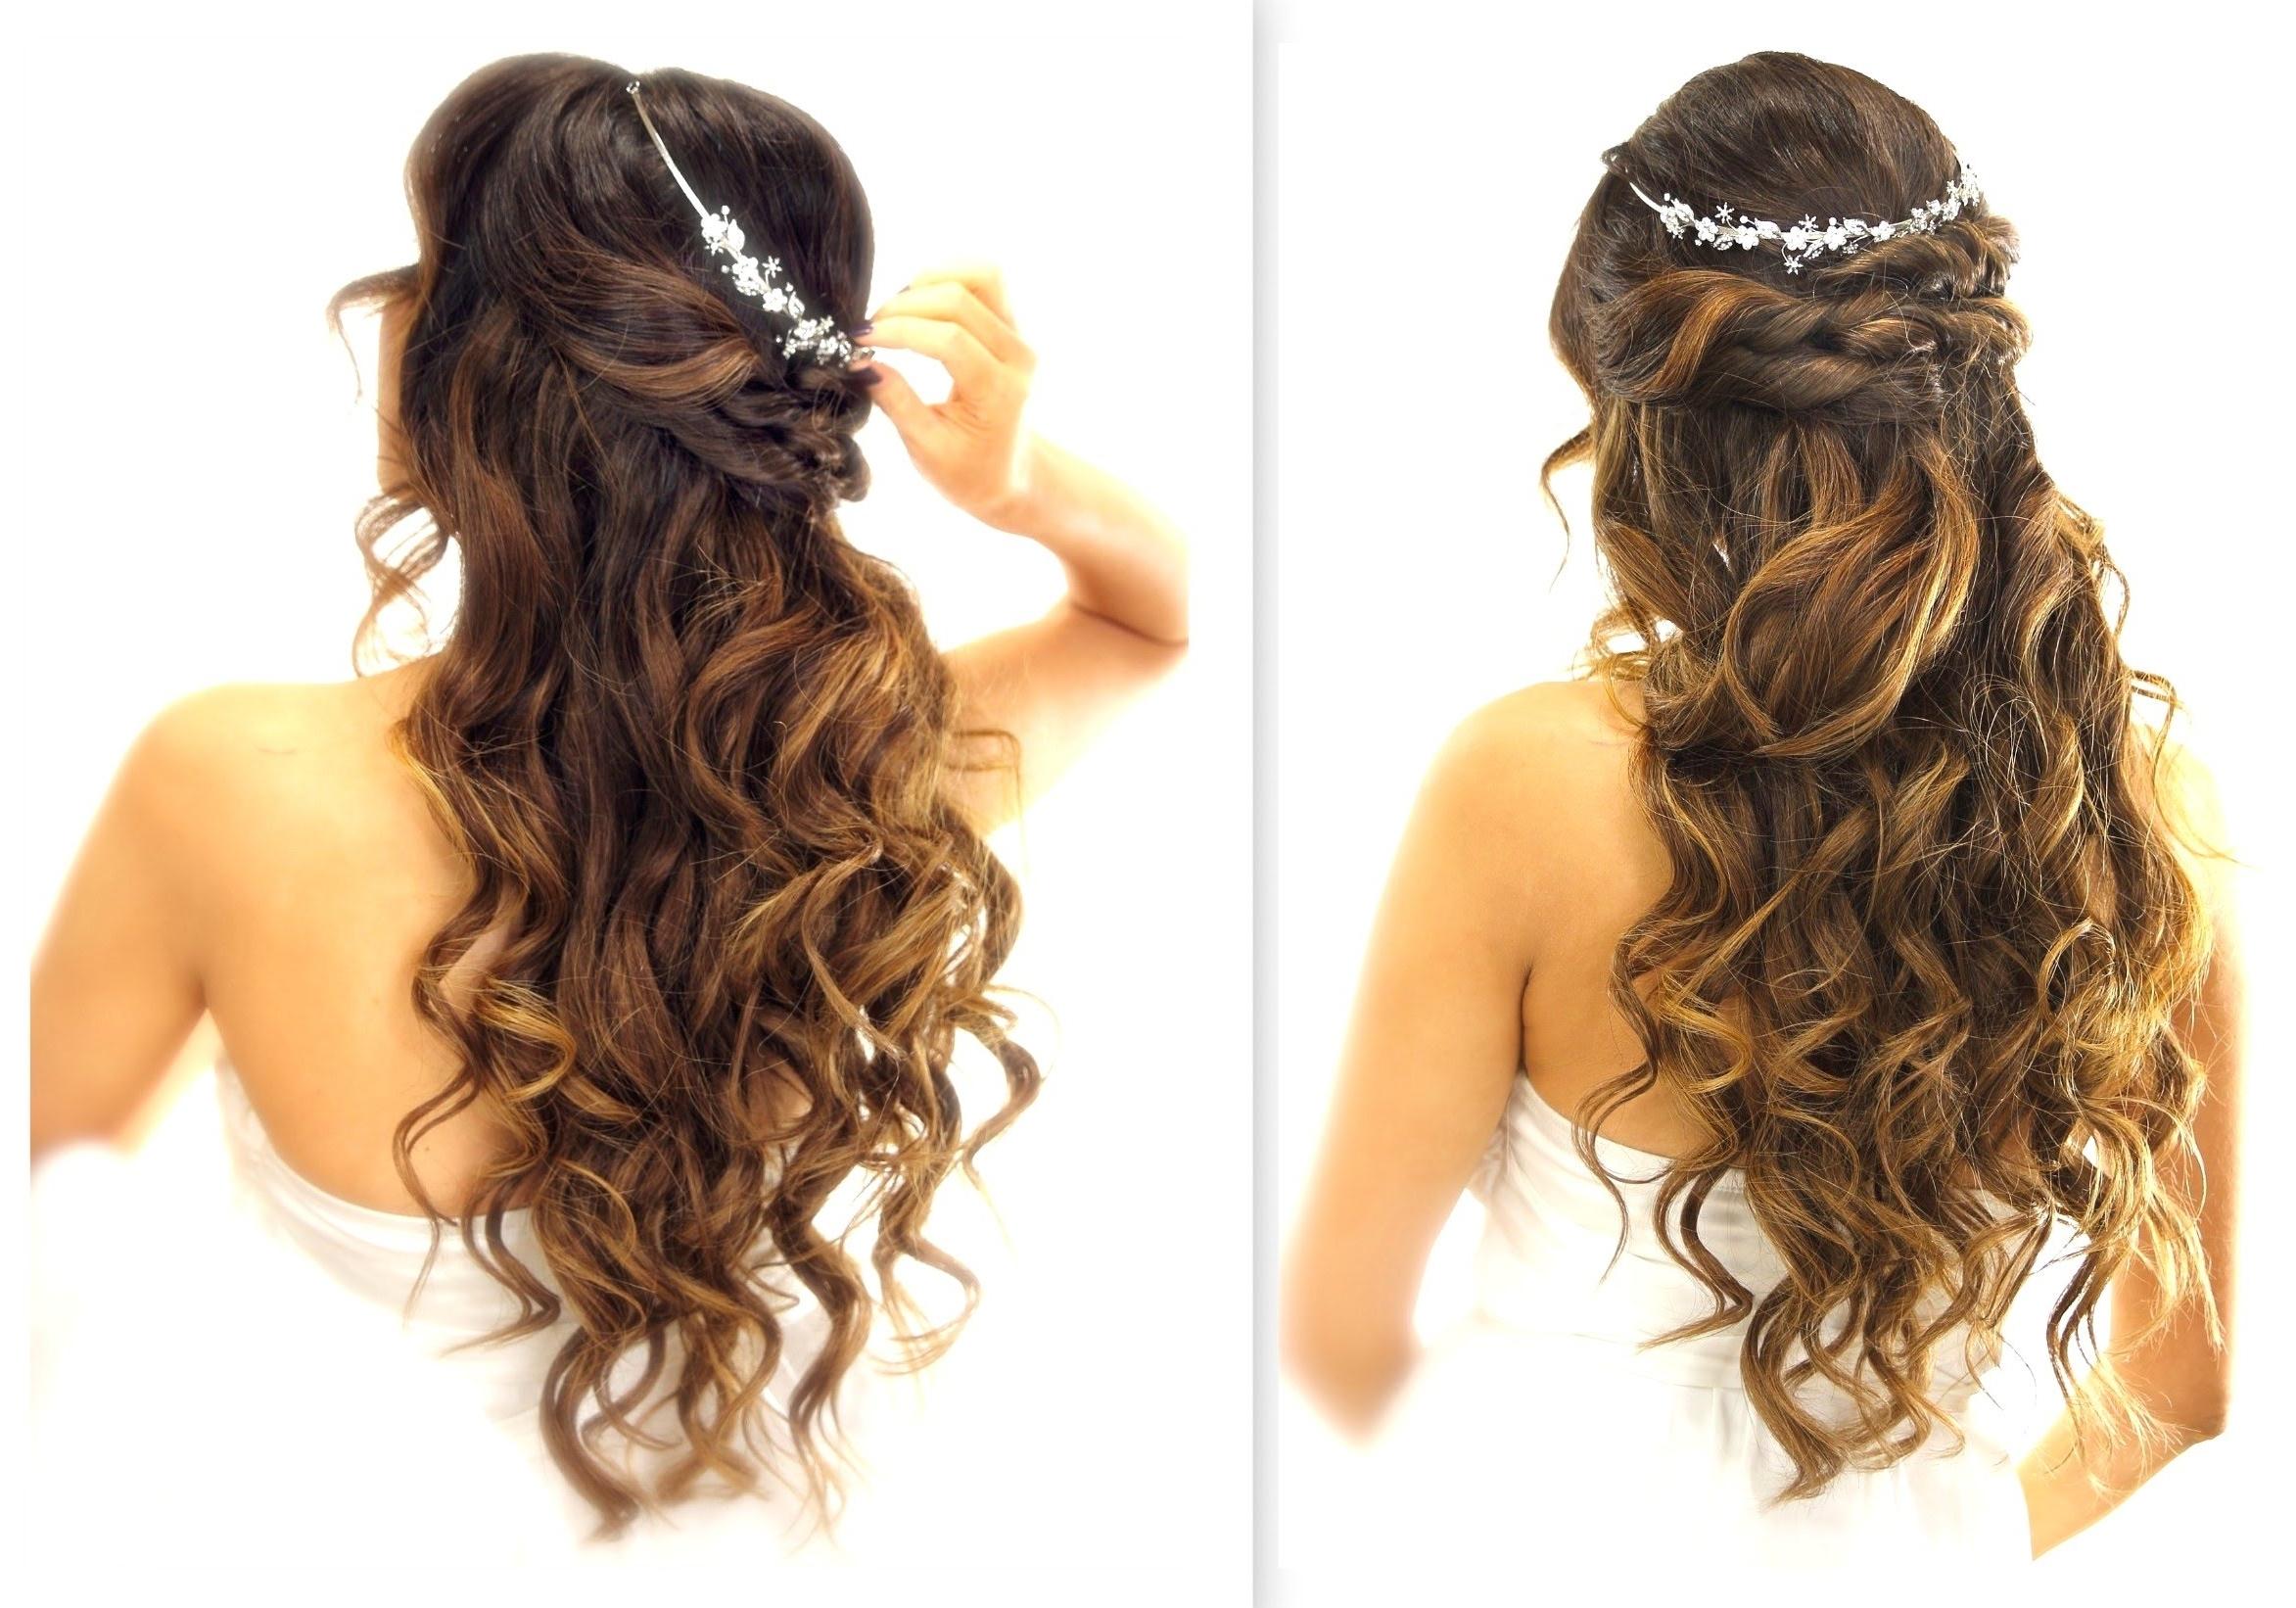 Trendy Down Short Hair Wedding Hairstyles Pertaining To Half Up Half Down Wedding Hairstyles For Short Hair – Top Hairstyle (View 10 of 15)